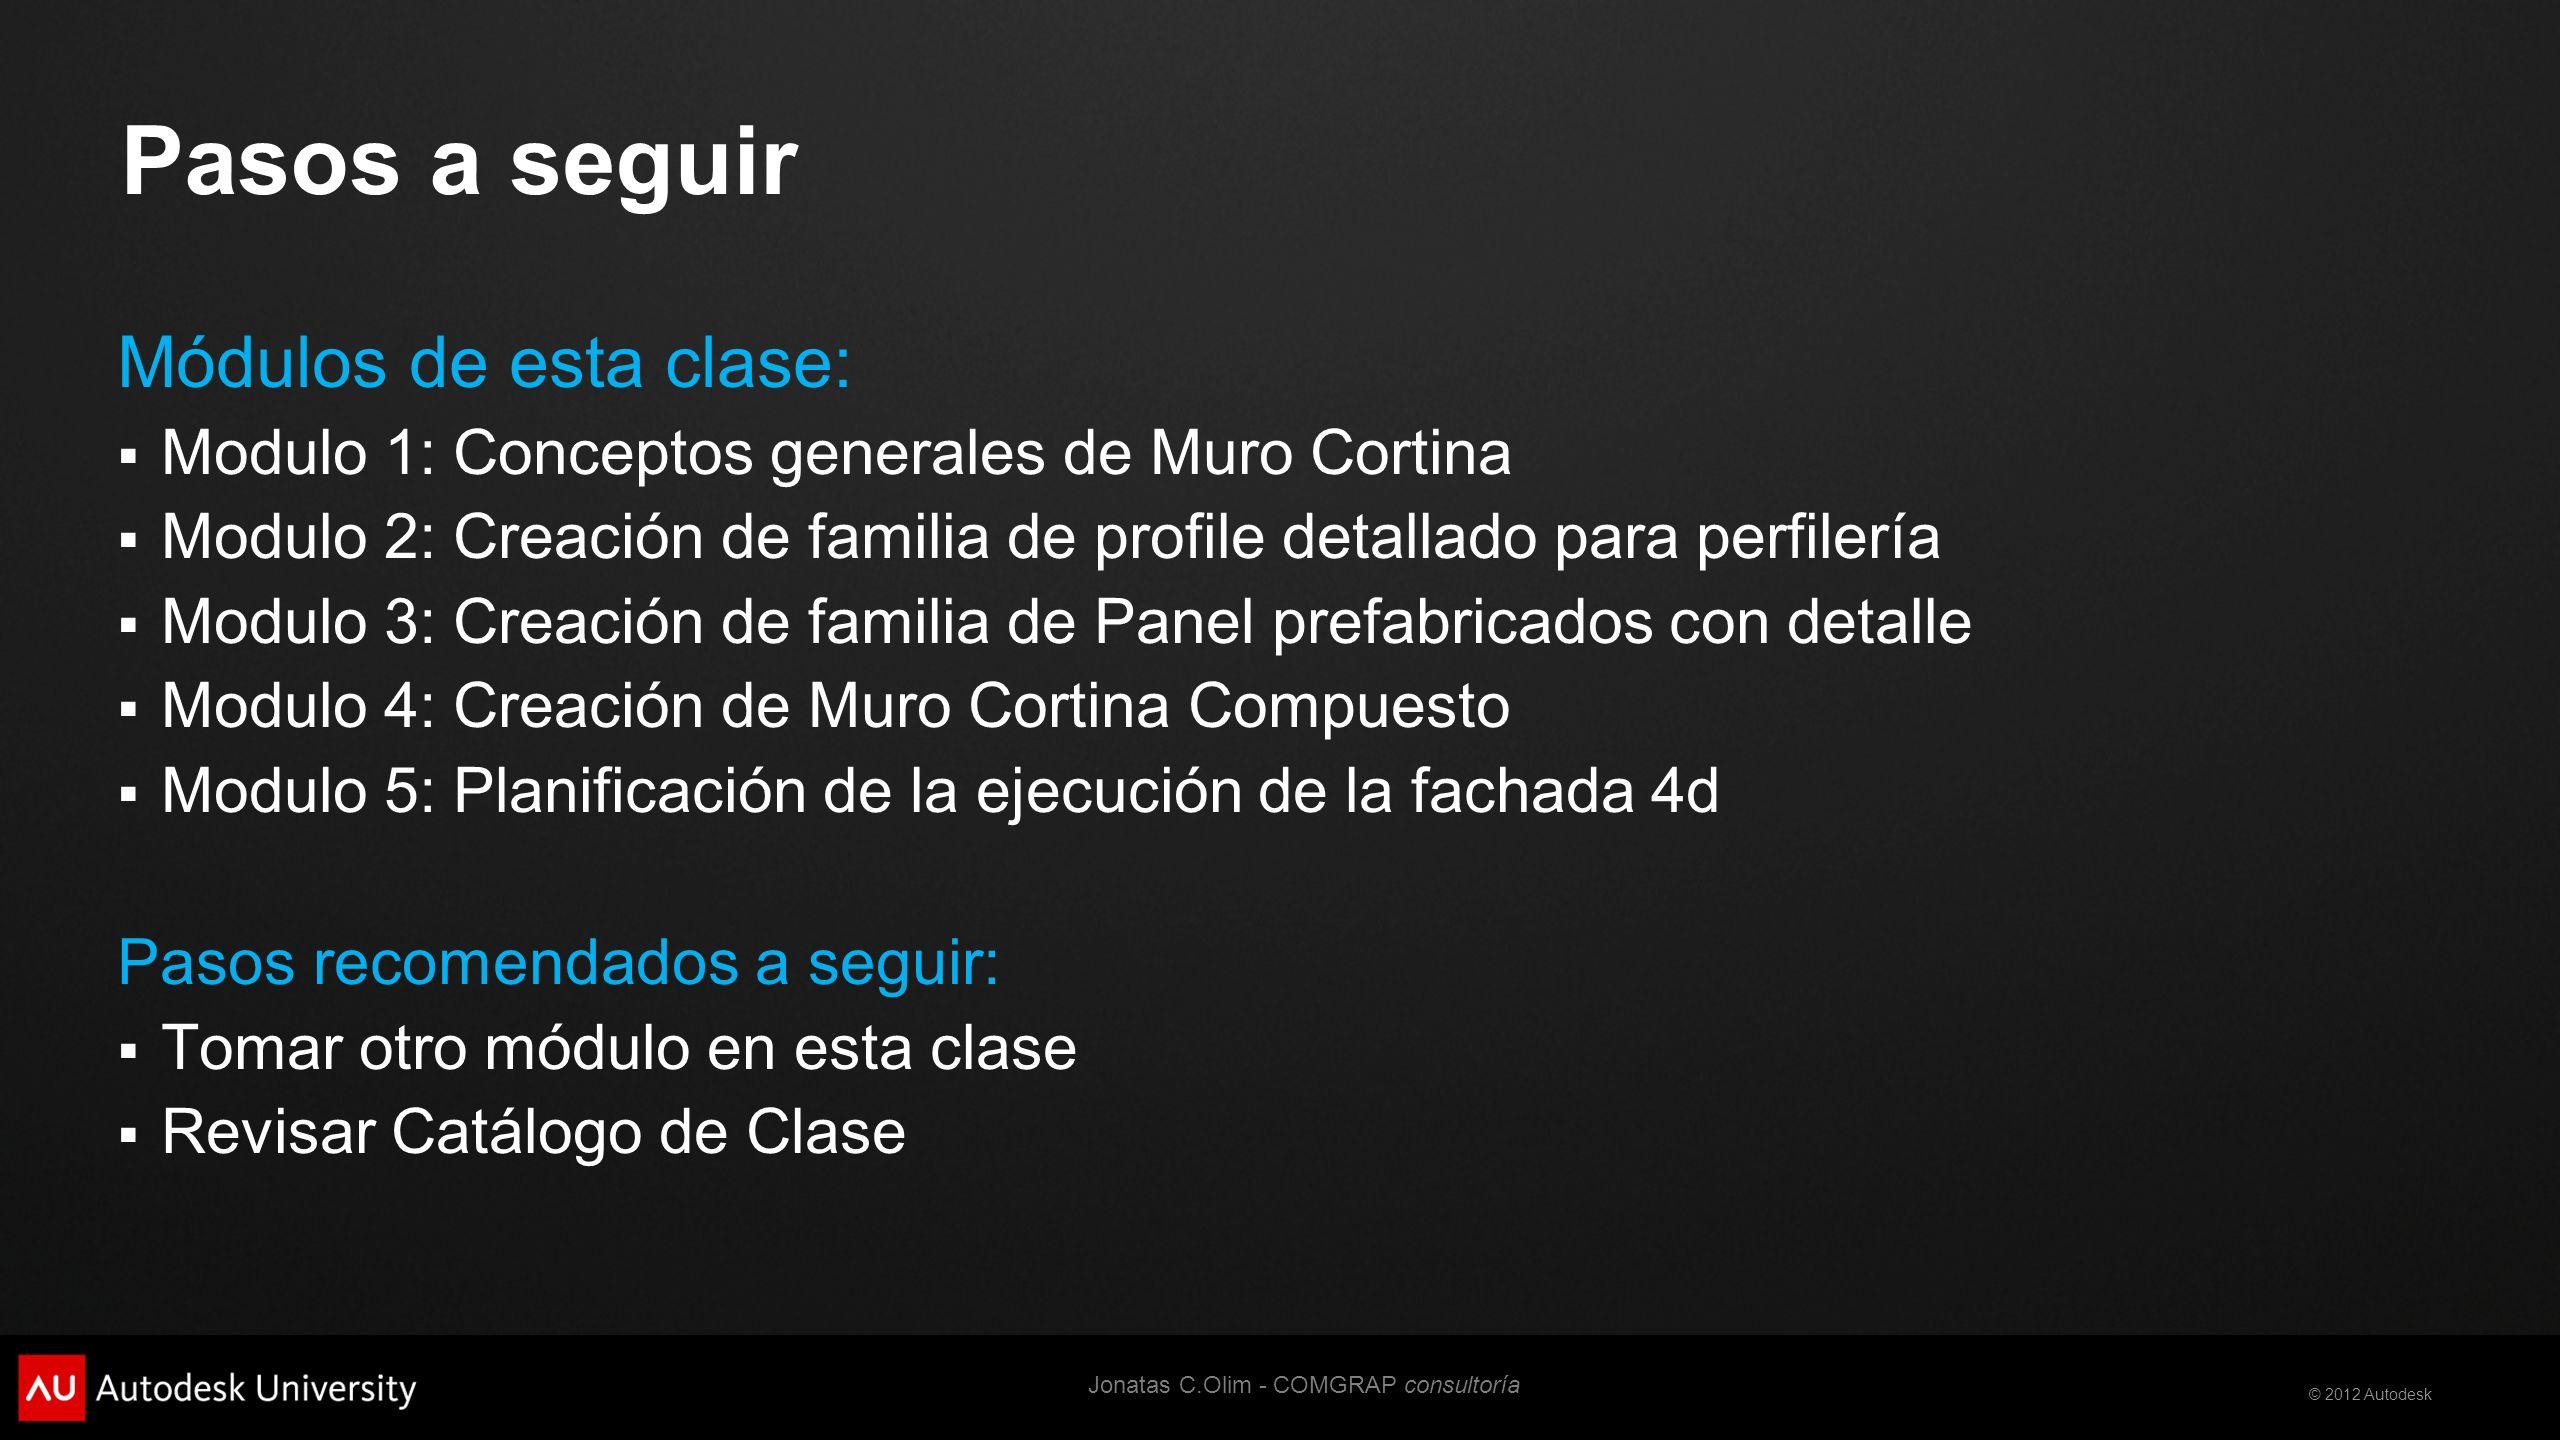 © 2012 Autodesk jonatas.decampos@comgrap.com jcolim@hotmail.com Jonatas C.Olim - COMGRAP consultoría Muchas Gracias …